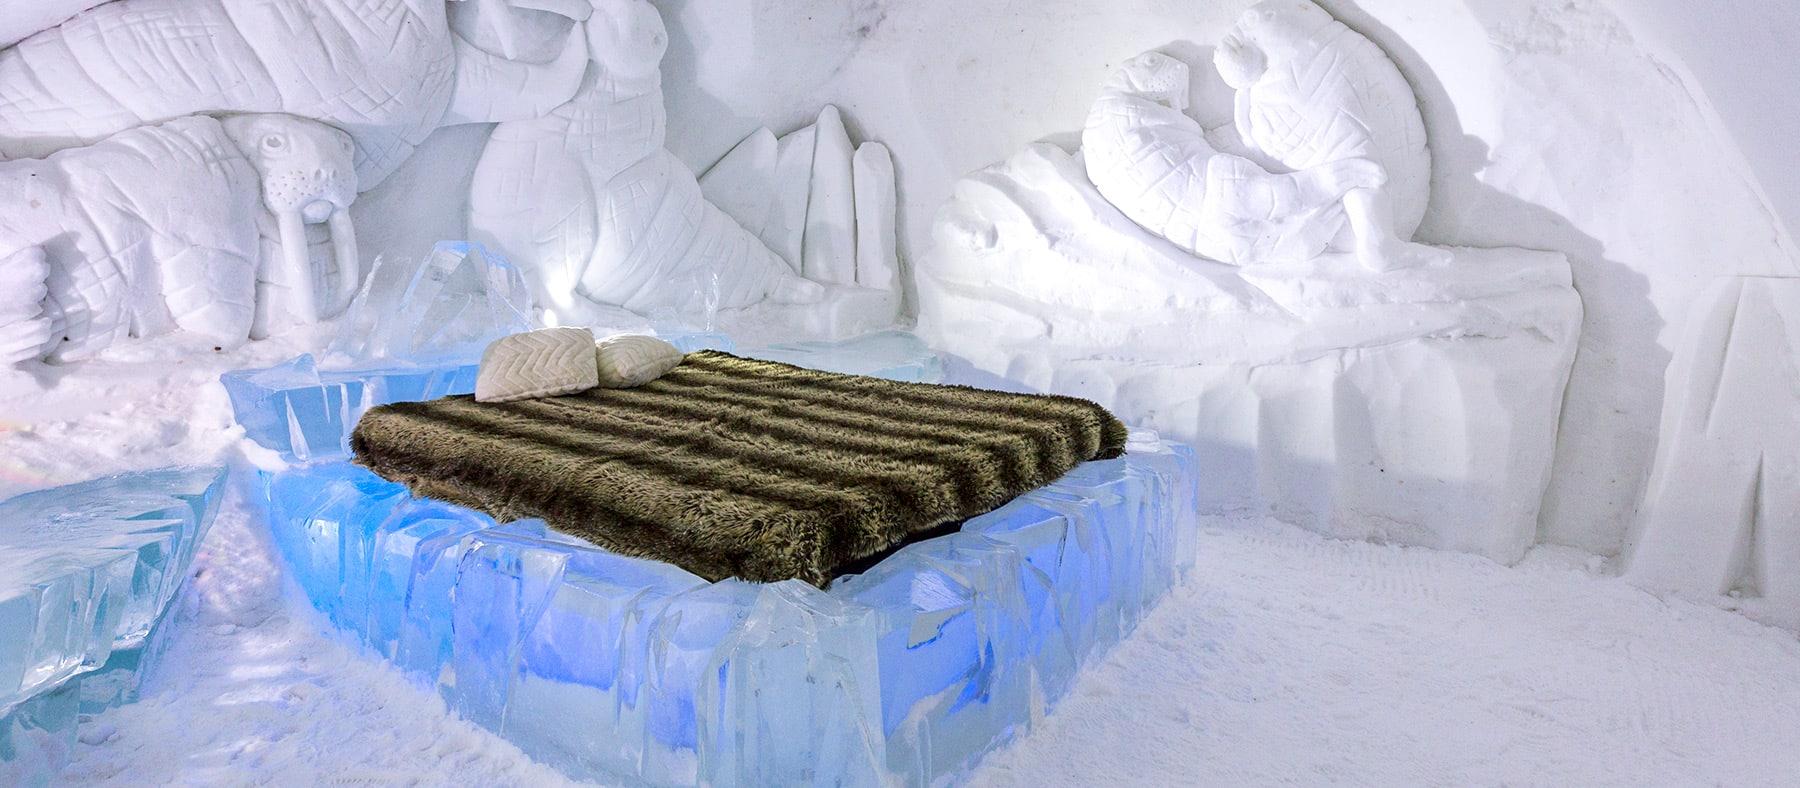 hotel-de-glace-quebec-hebergement-insolite-hiver-quebec-le-mag